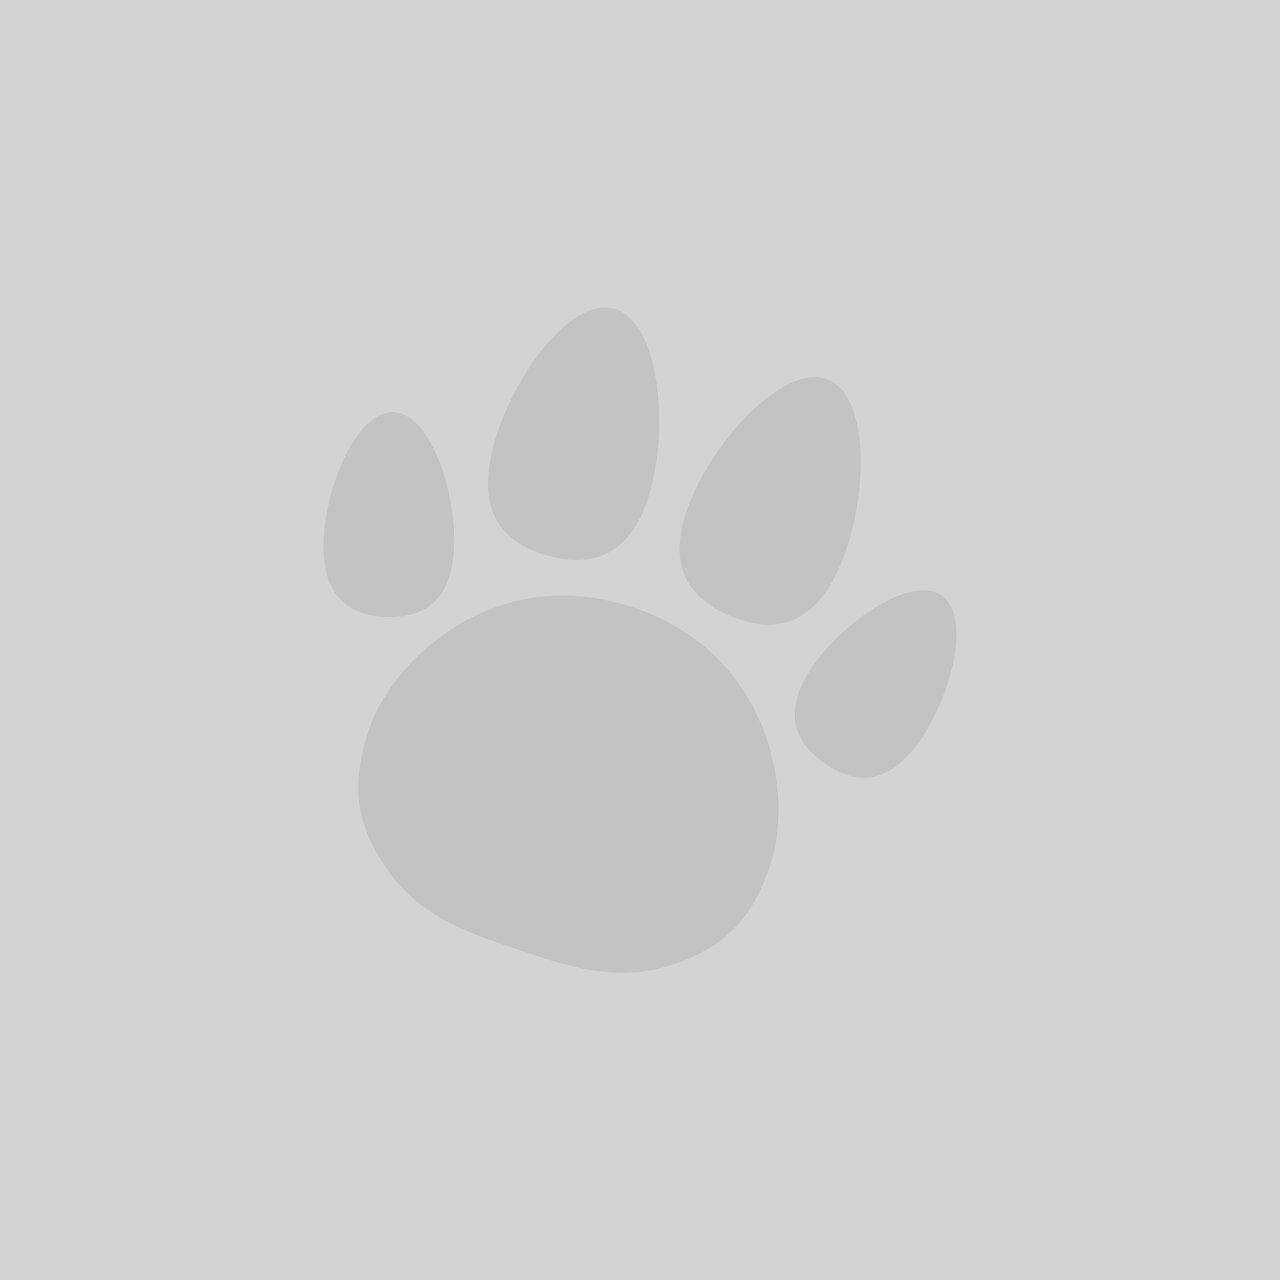 Doodlebone Airmesh Dog Harness Black Small